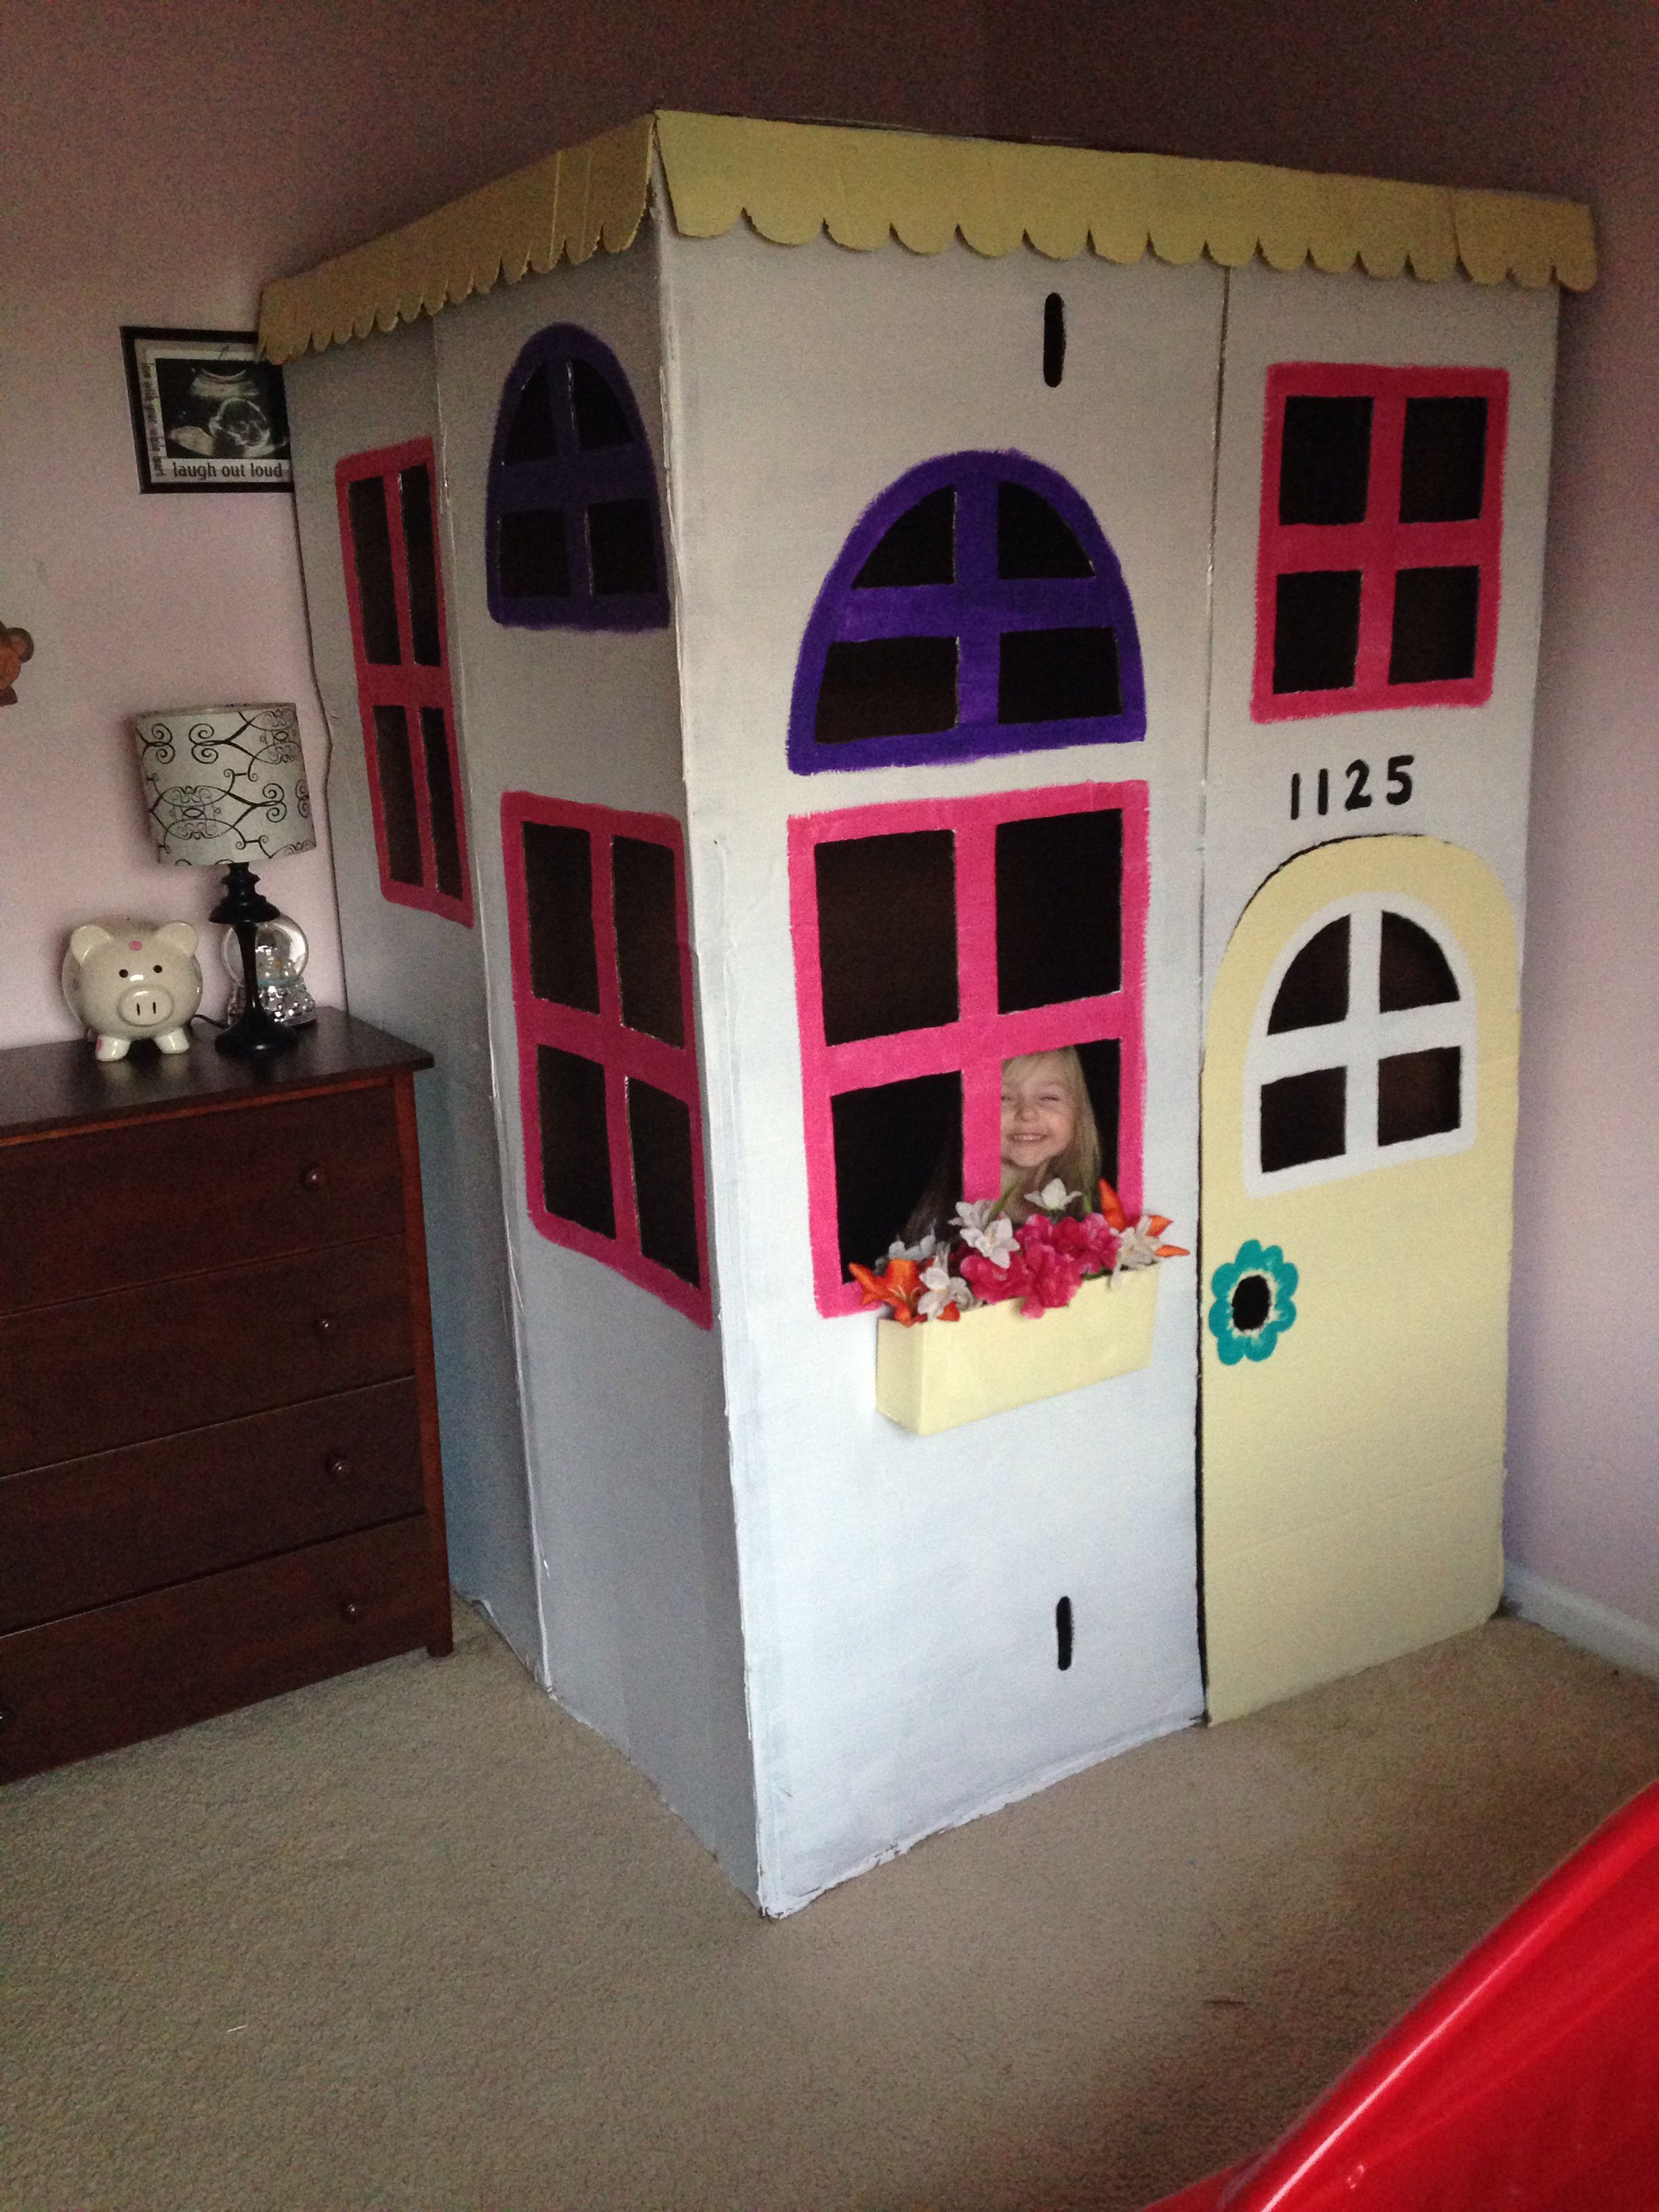 Cardboard box playhouse diy   Pins I've Done   Pinterest ...